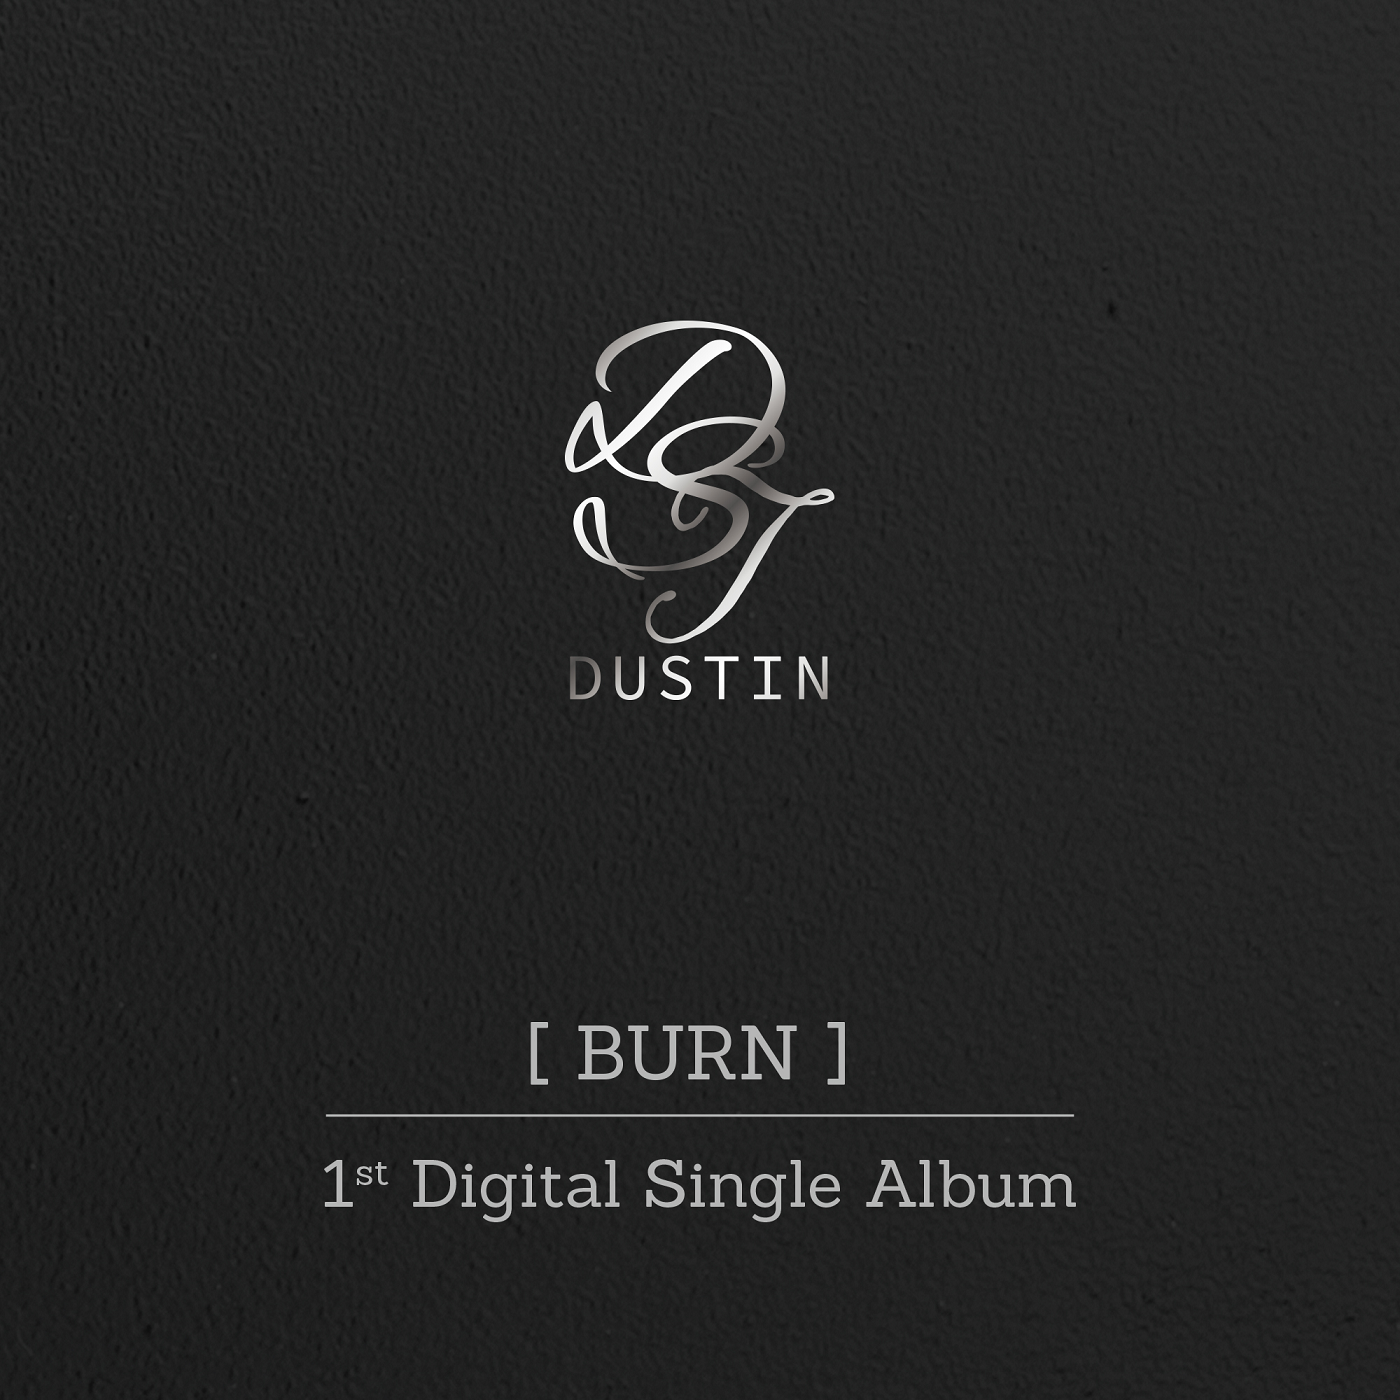 Burn (Dustin)